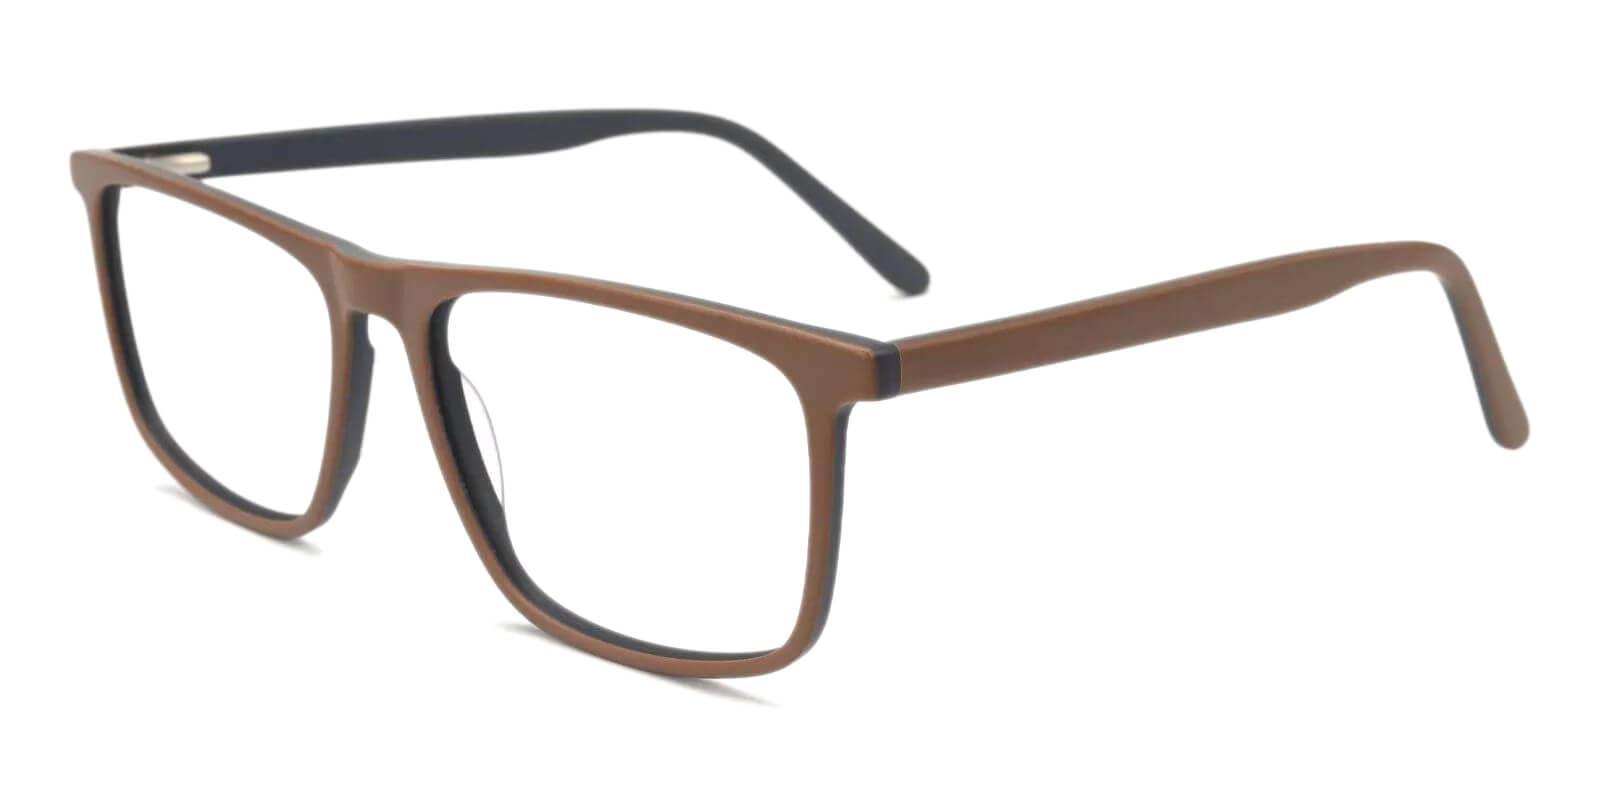 Doris Brown Acetate Eyeglasses , Fashion , SpringHinges , UniversalBridgeFit Frames from ABBE Glasses